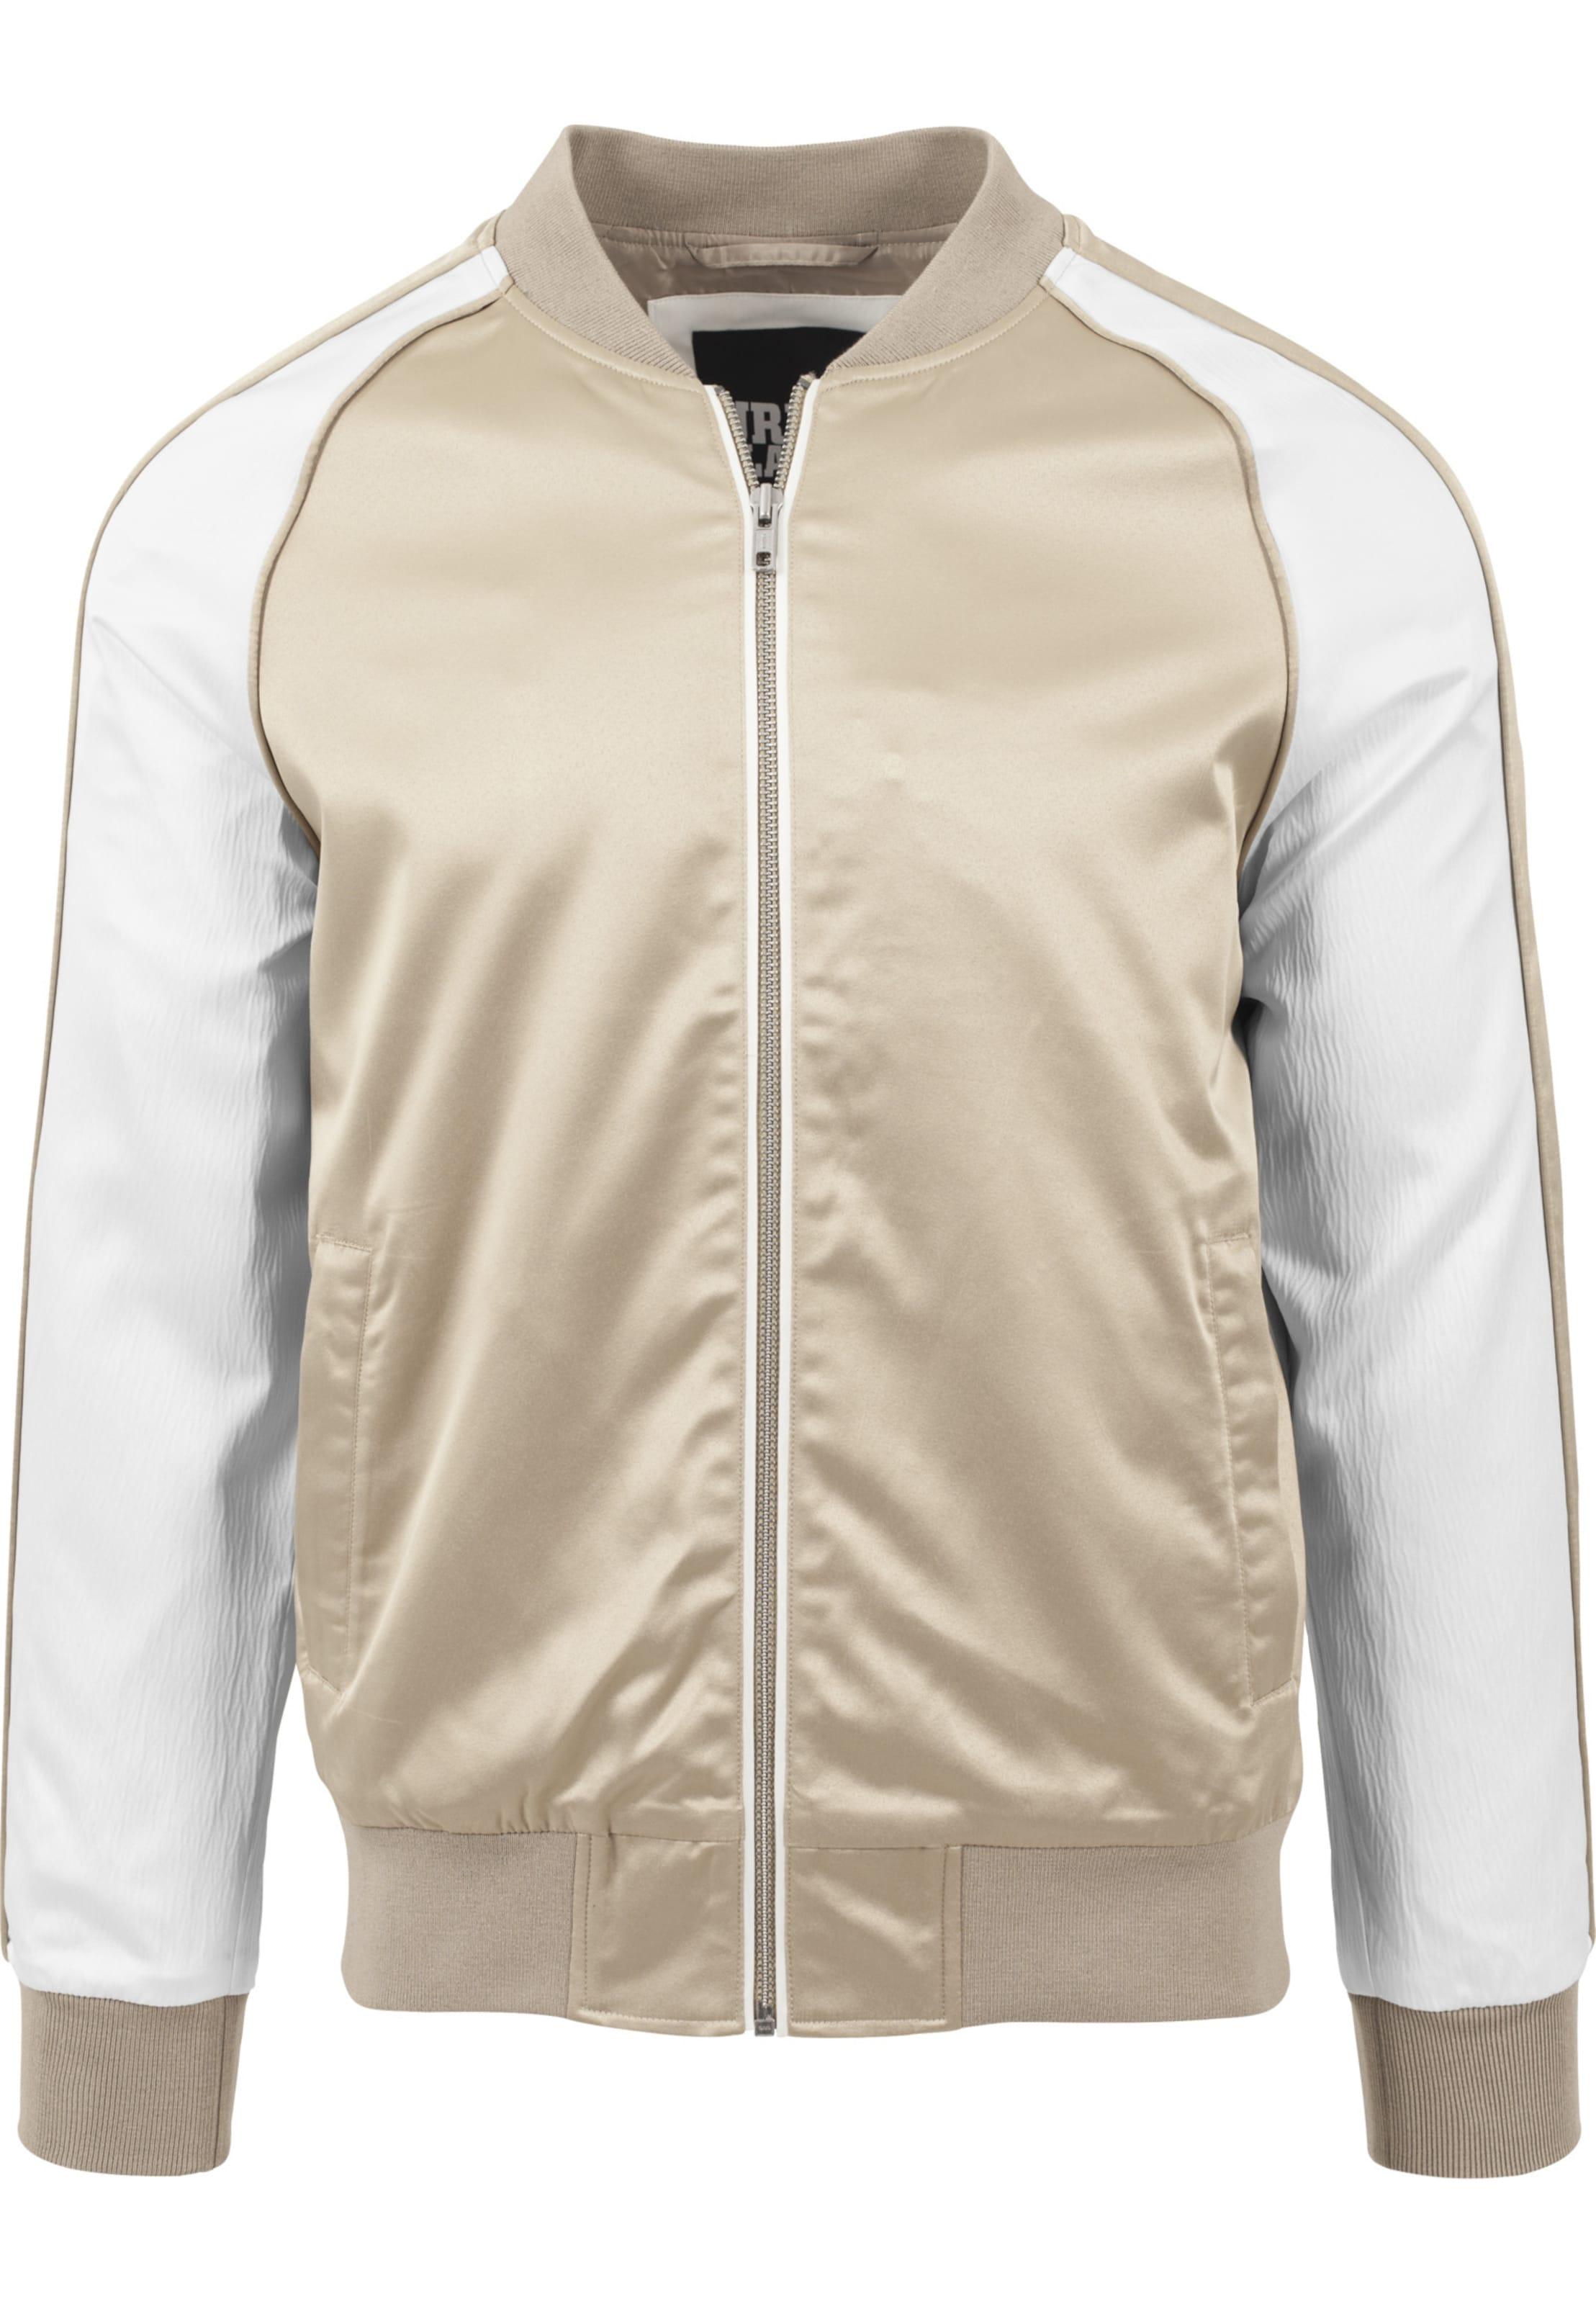 Urban Classics Jacket In Urban Classics GoldWeiß Classics GoldWeiß In Urban Jacket uPkiOXZ